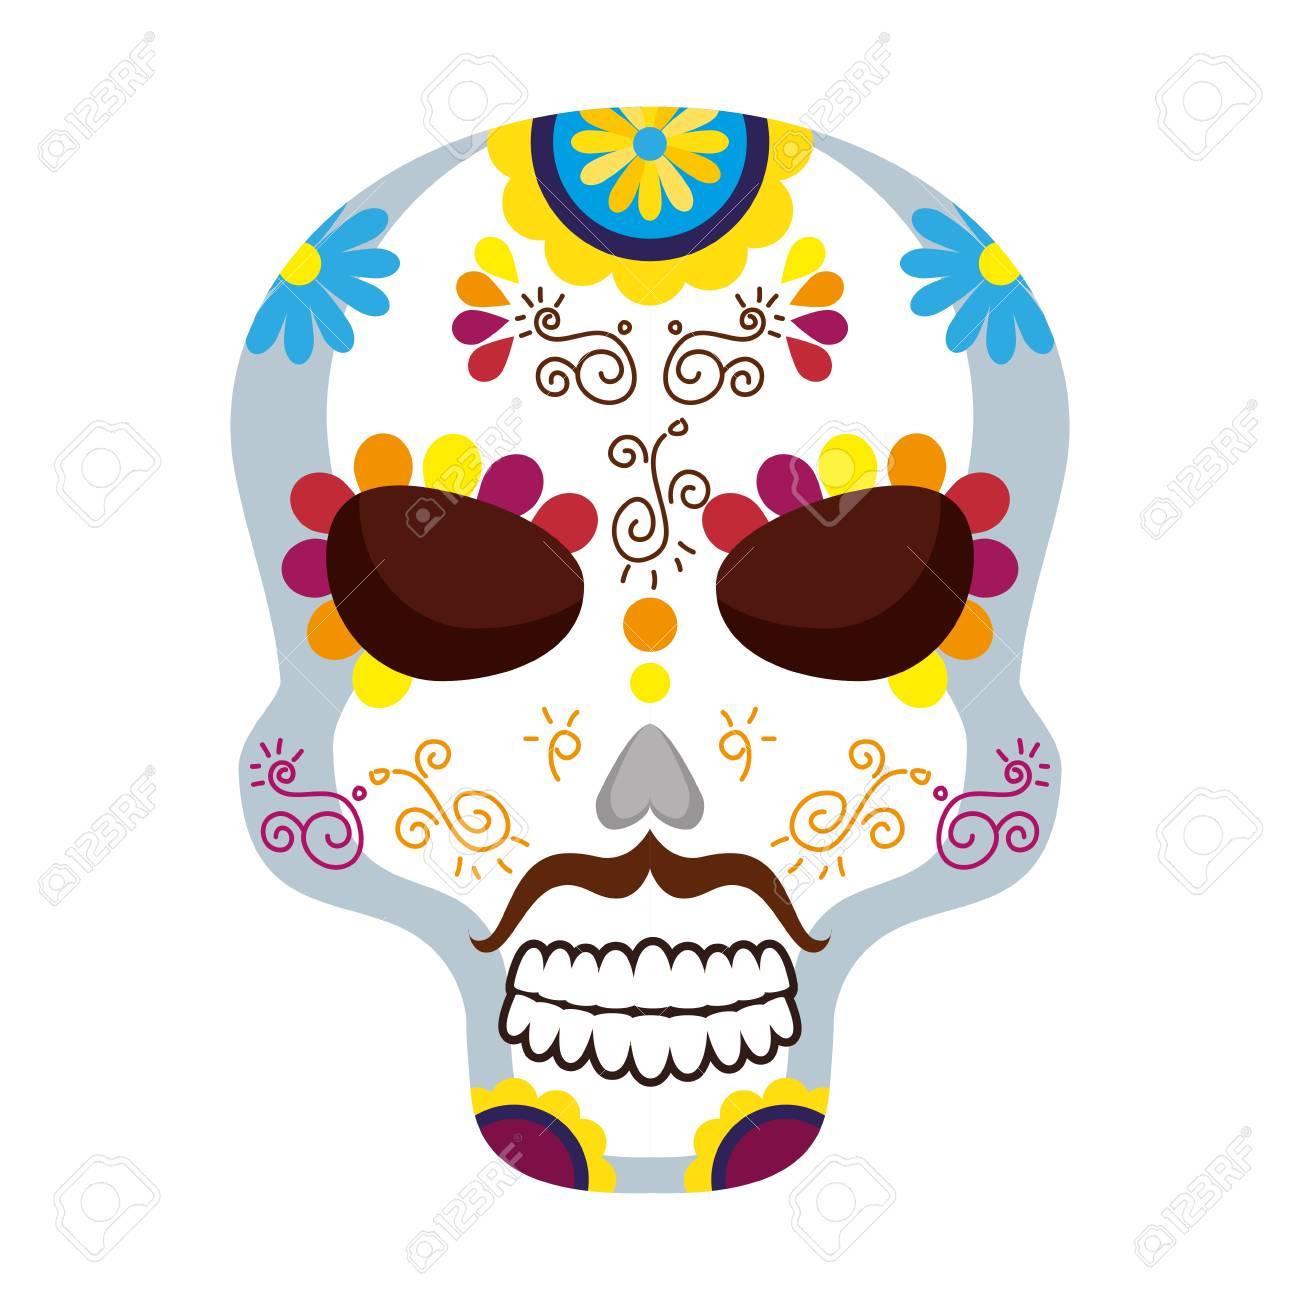 Mask Of The Santa Death Vector Illustration Design Royalty Free